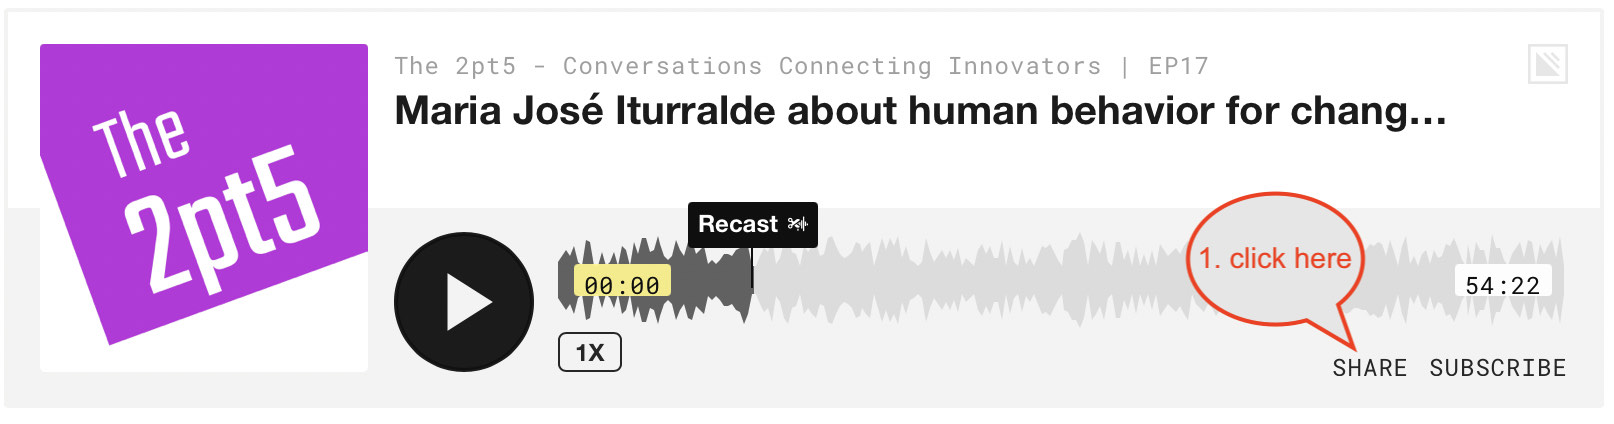 Podcast einbetten Schritt 1